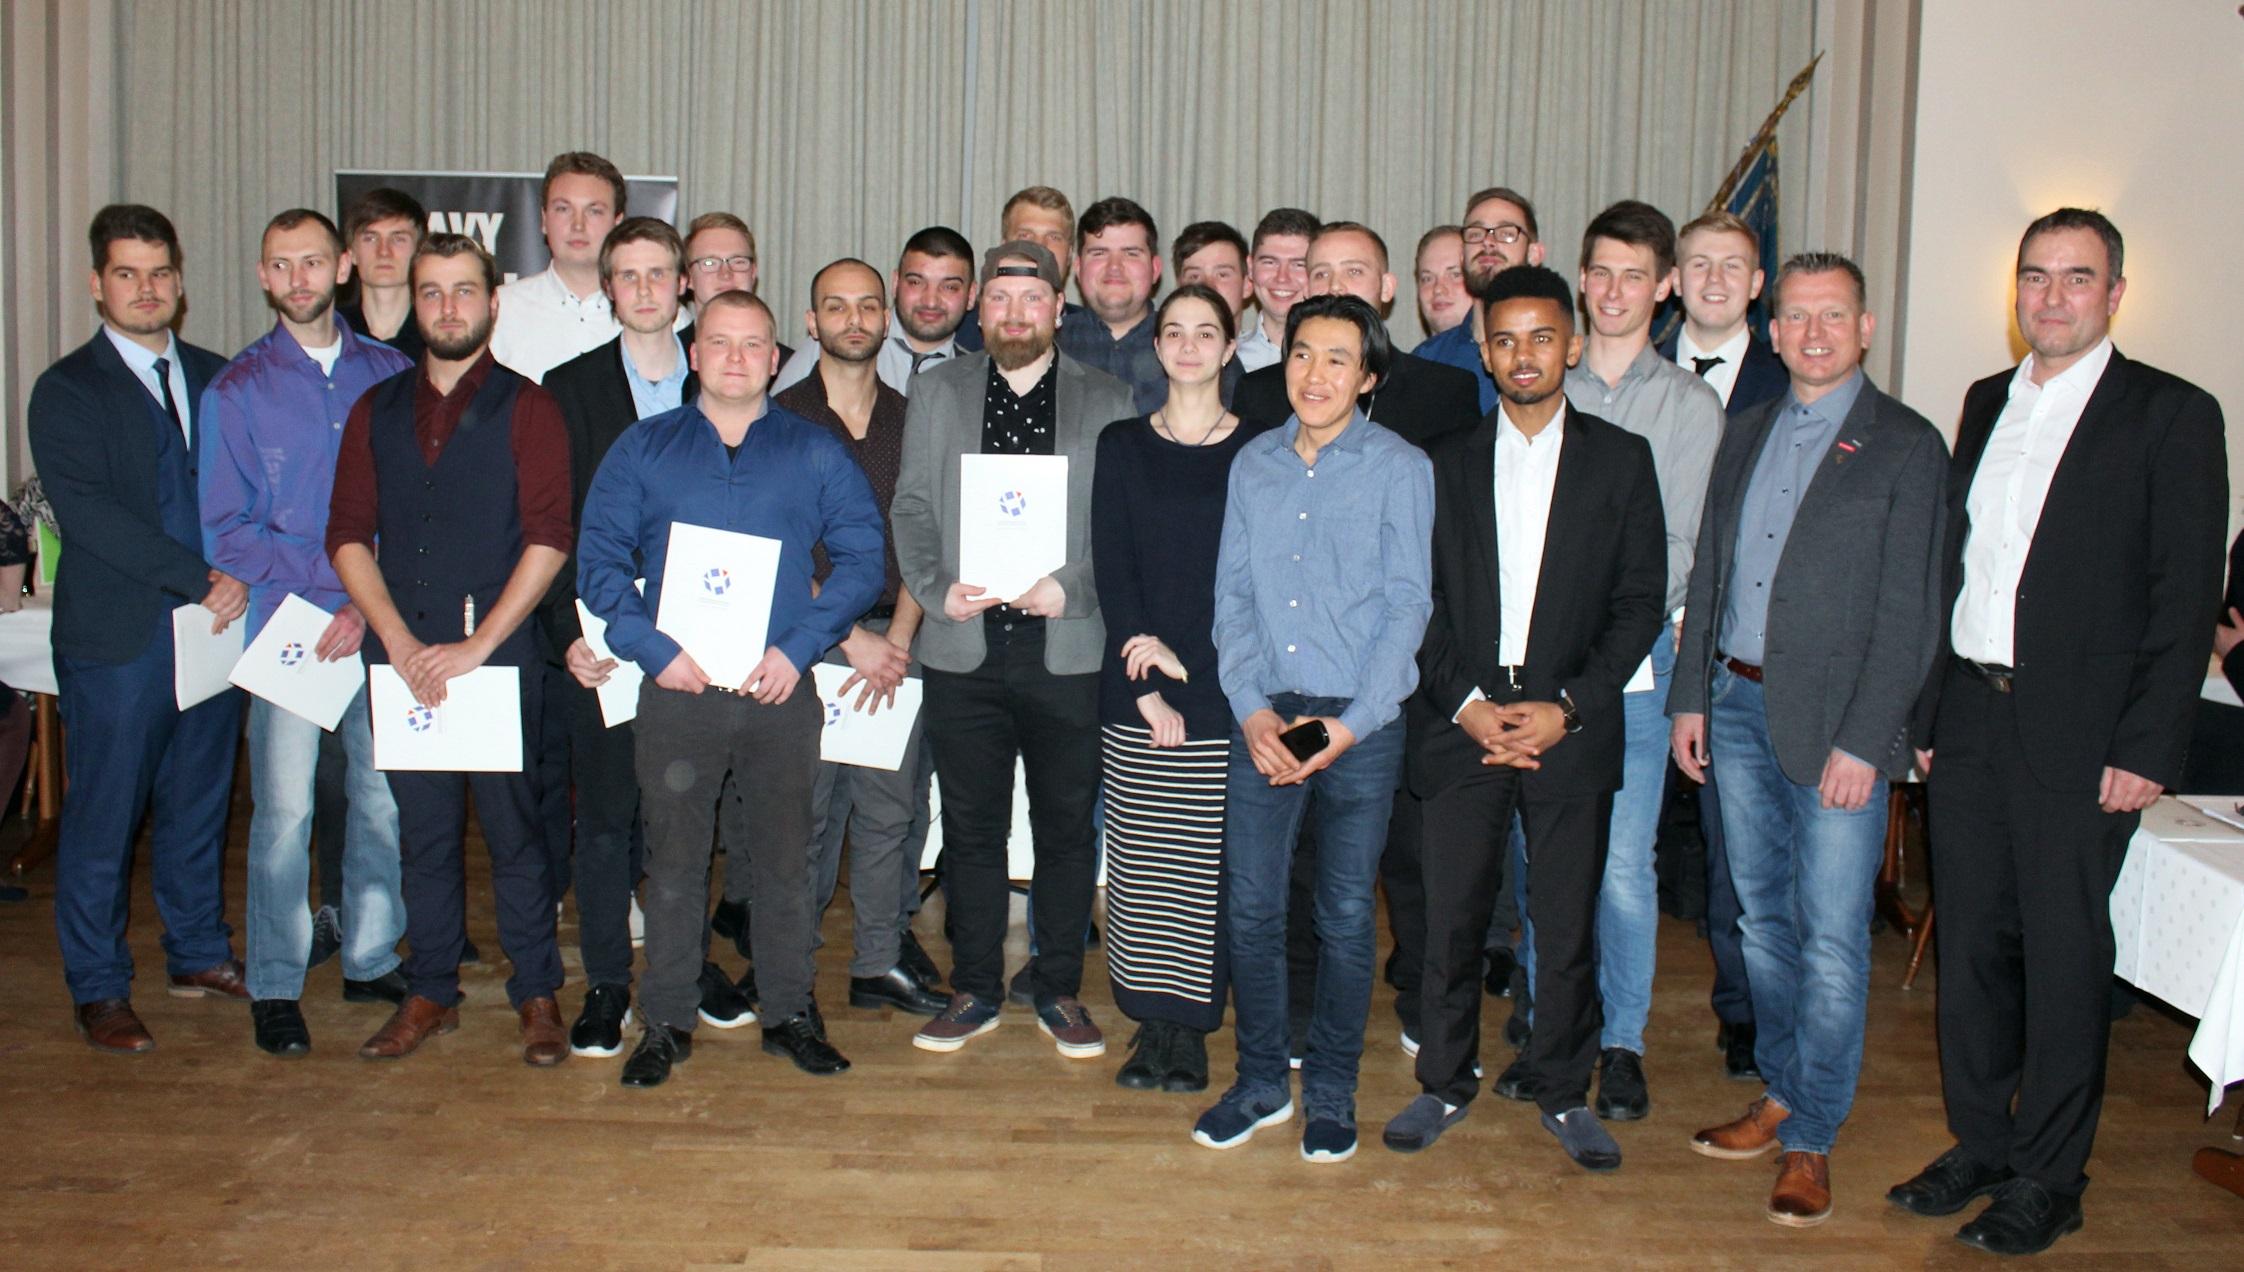 Kreishandwerkerschaft Flensburg FS Metall 2019